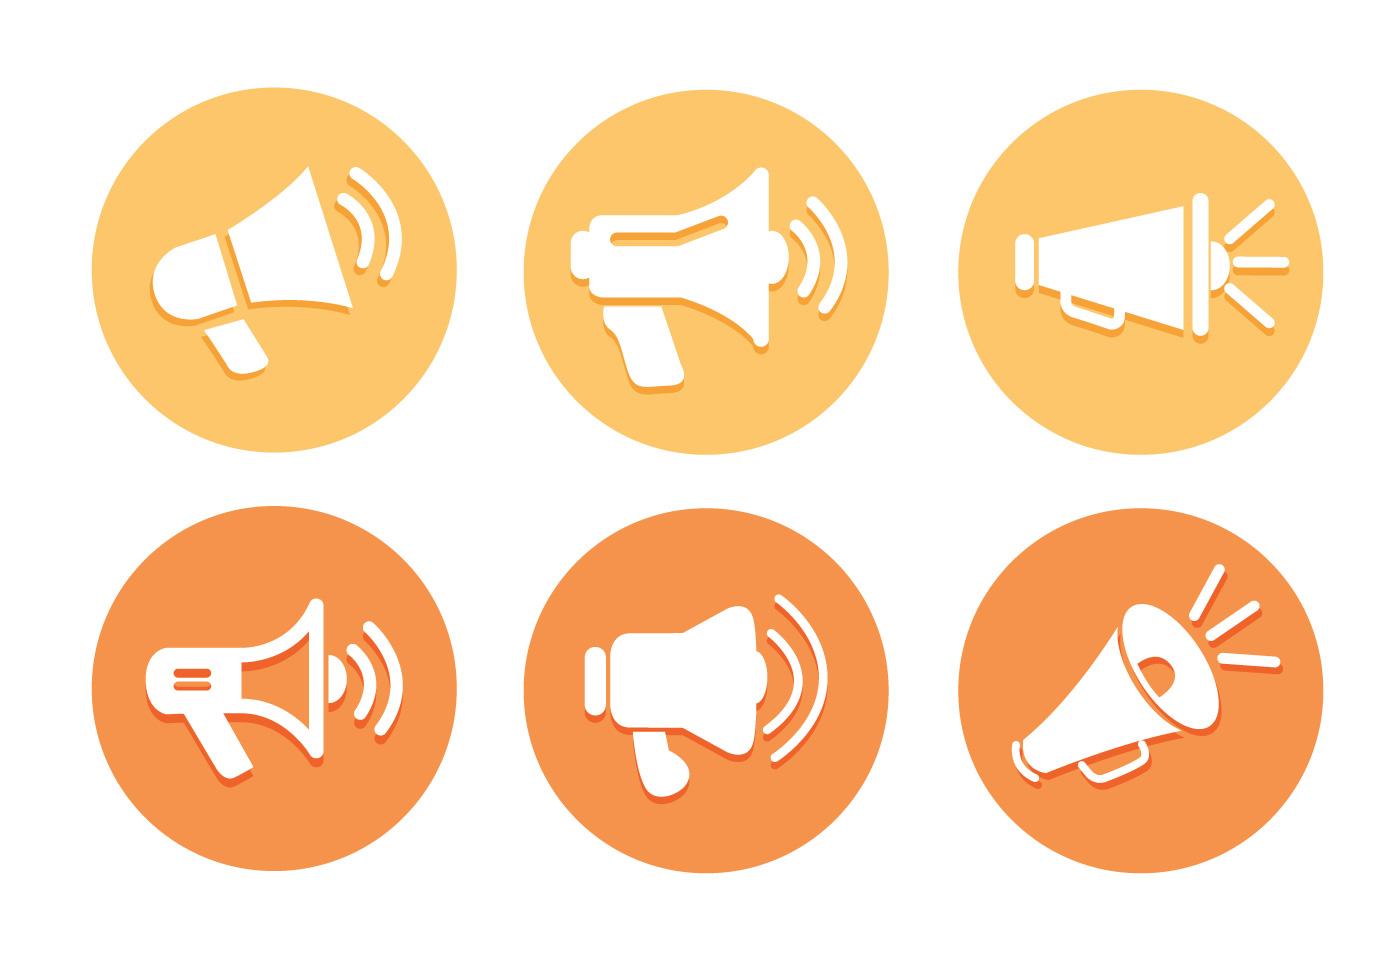 Vecteurs icne mgaphone Tlchargez de l39art des